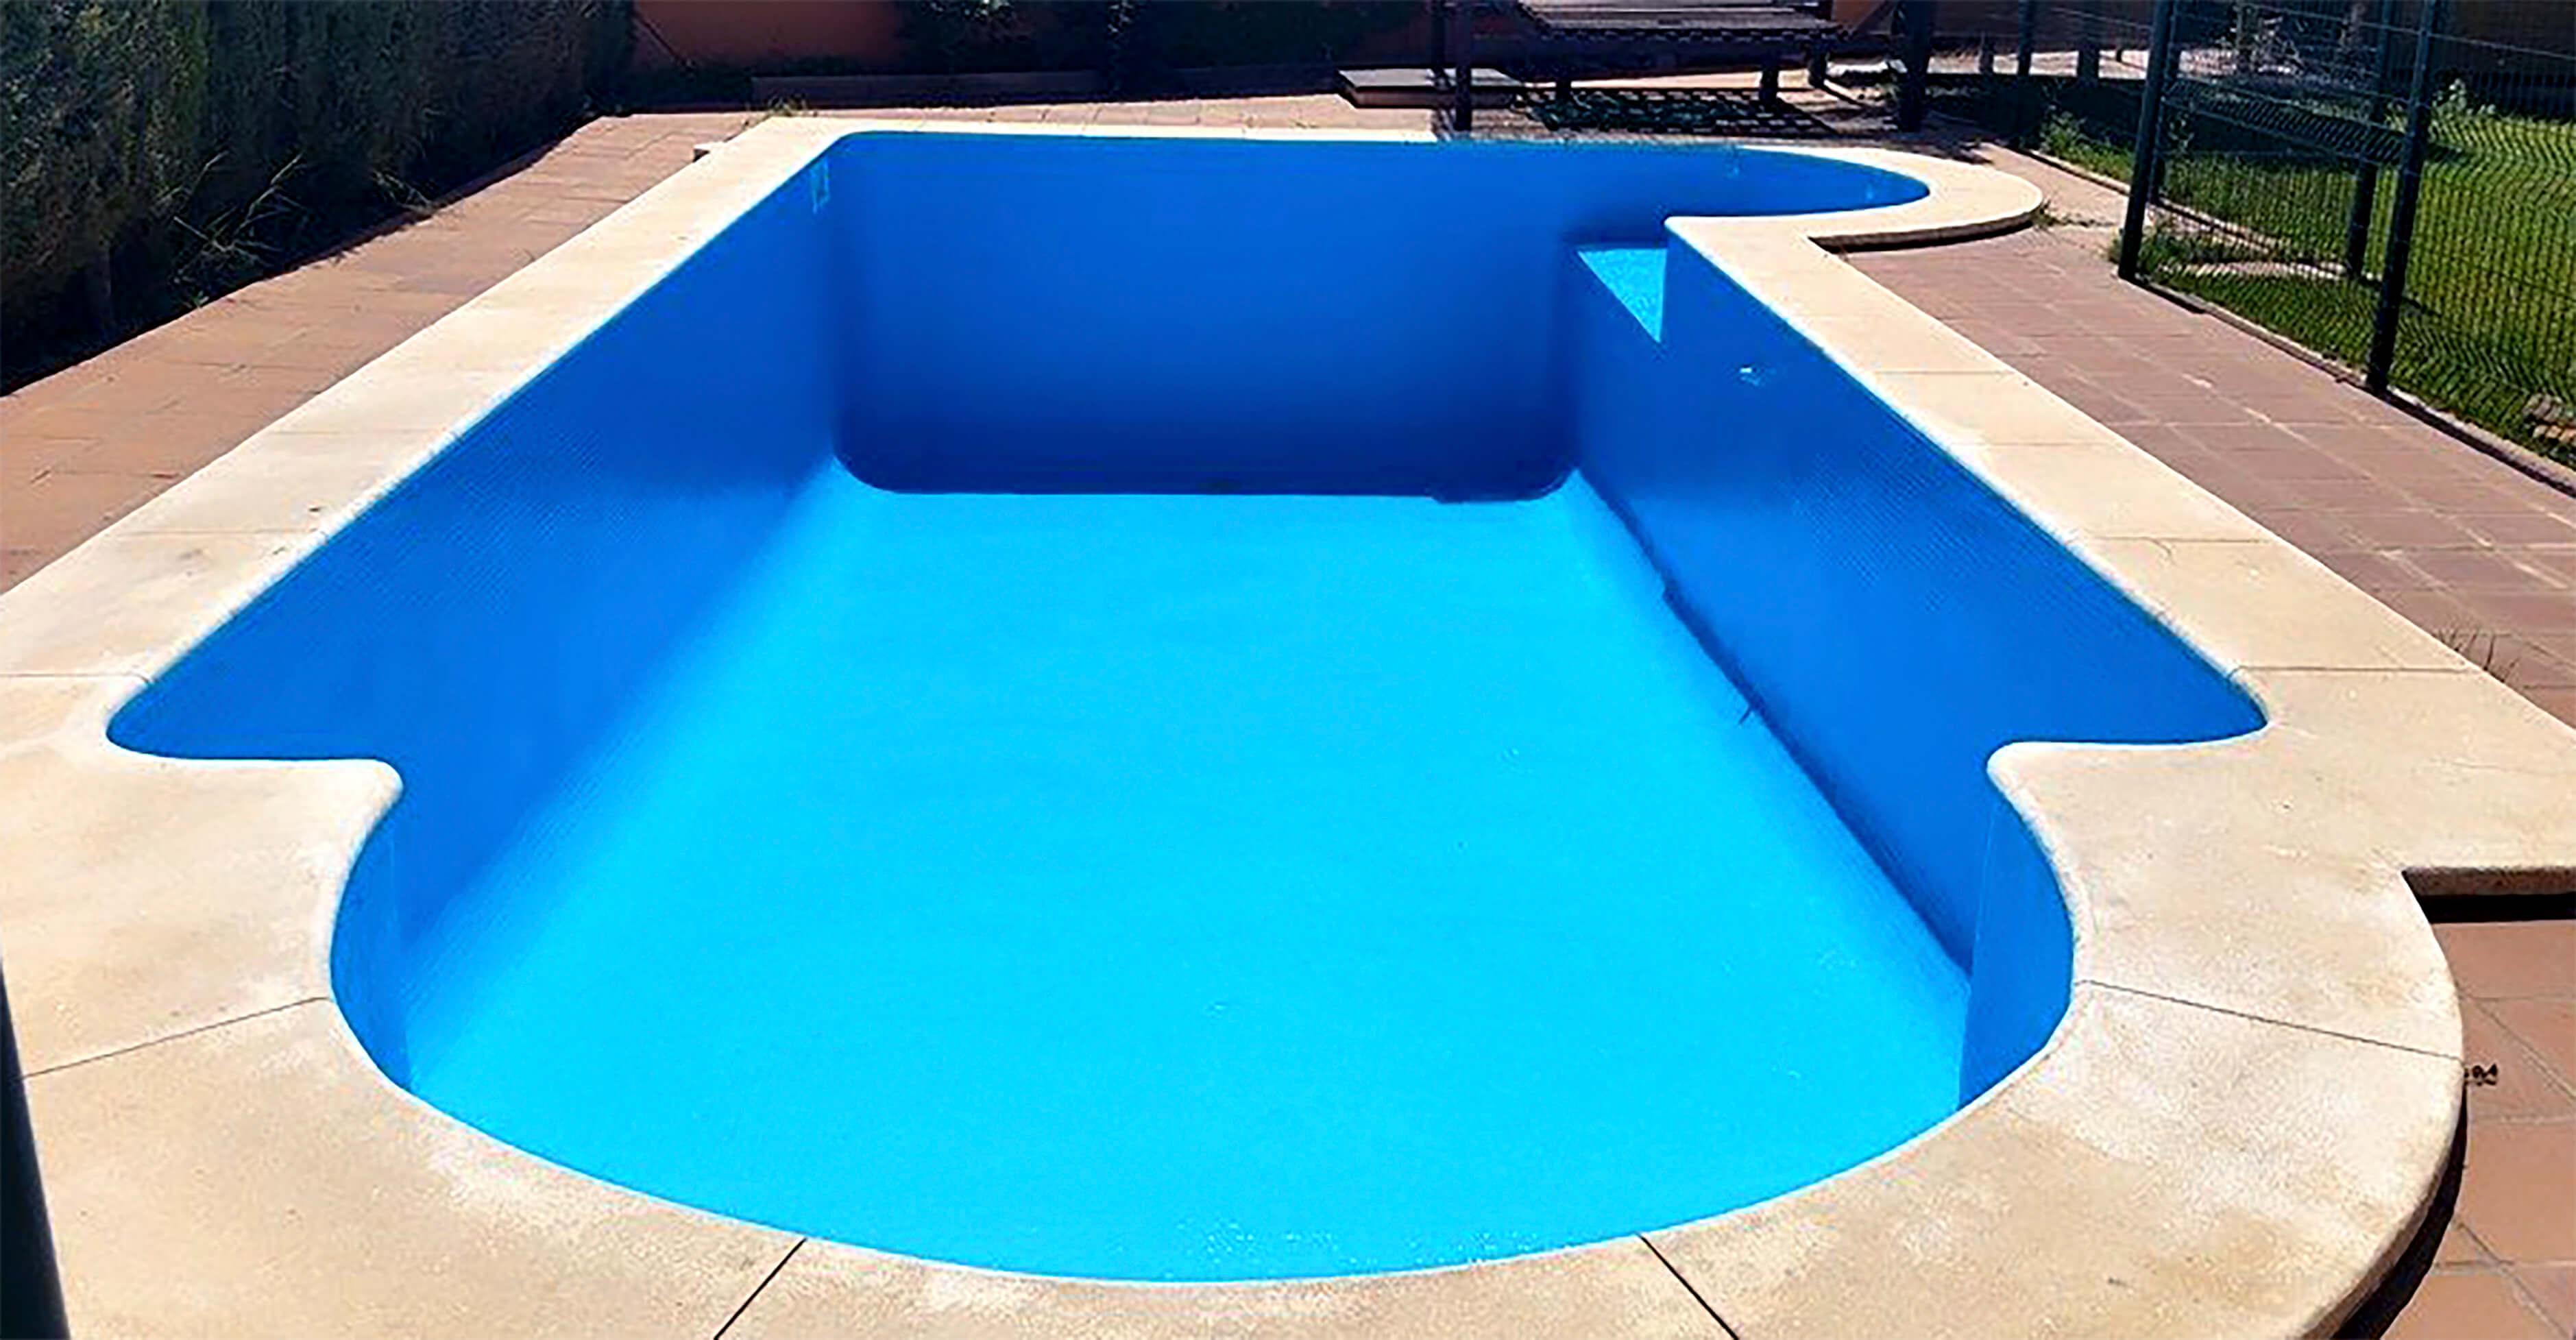 Технология гидроизоляции бассейнов